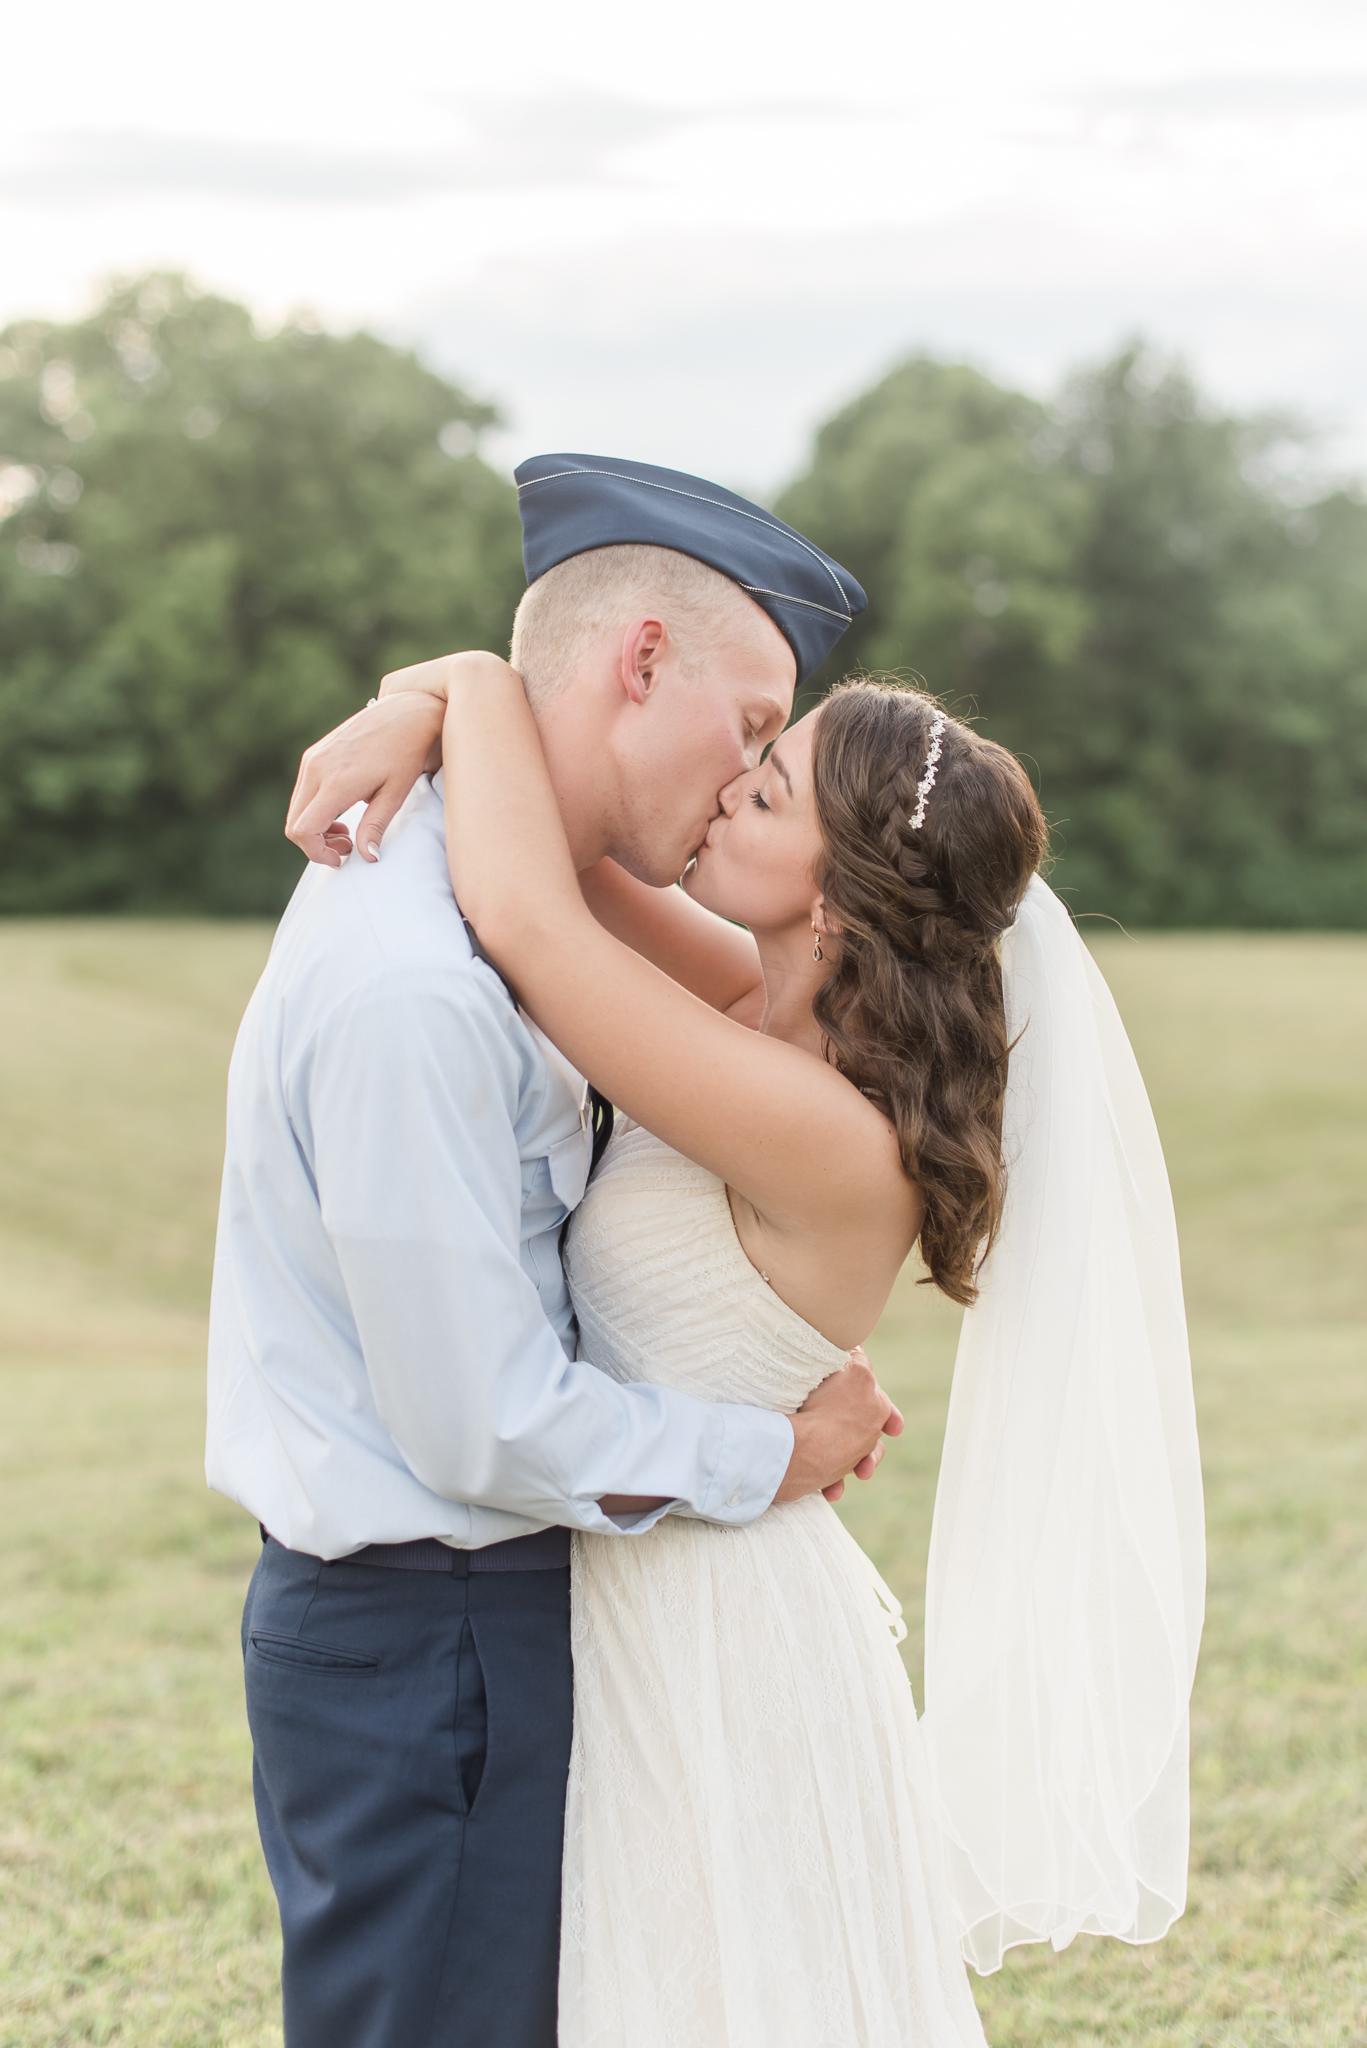 Anderson, Indiana Wedding Photographers5352.jpg